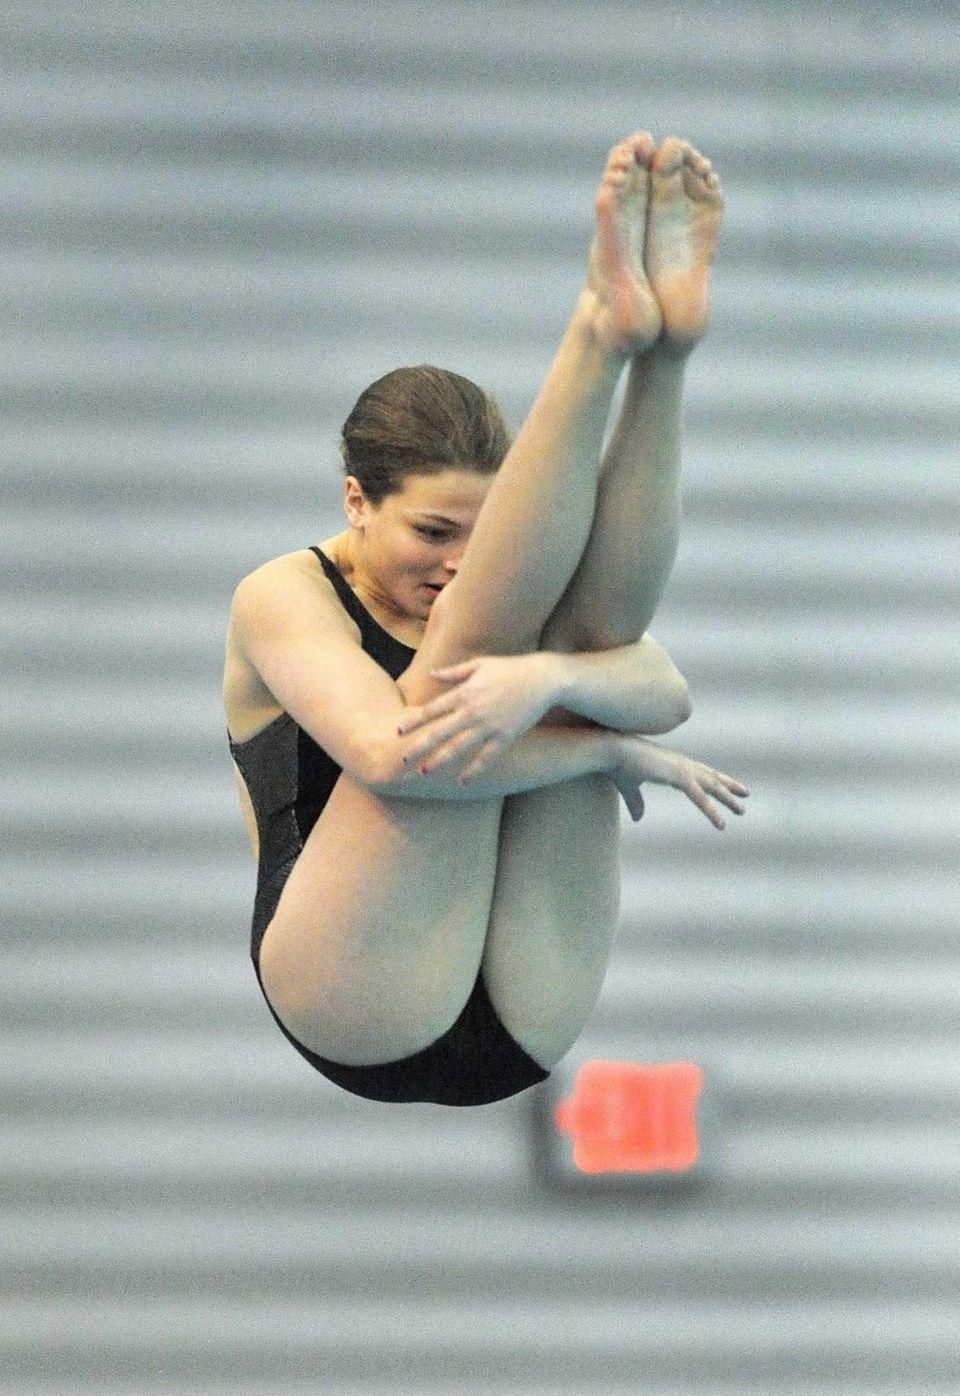 Sachem North's Rachel Heymach performs a dive during